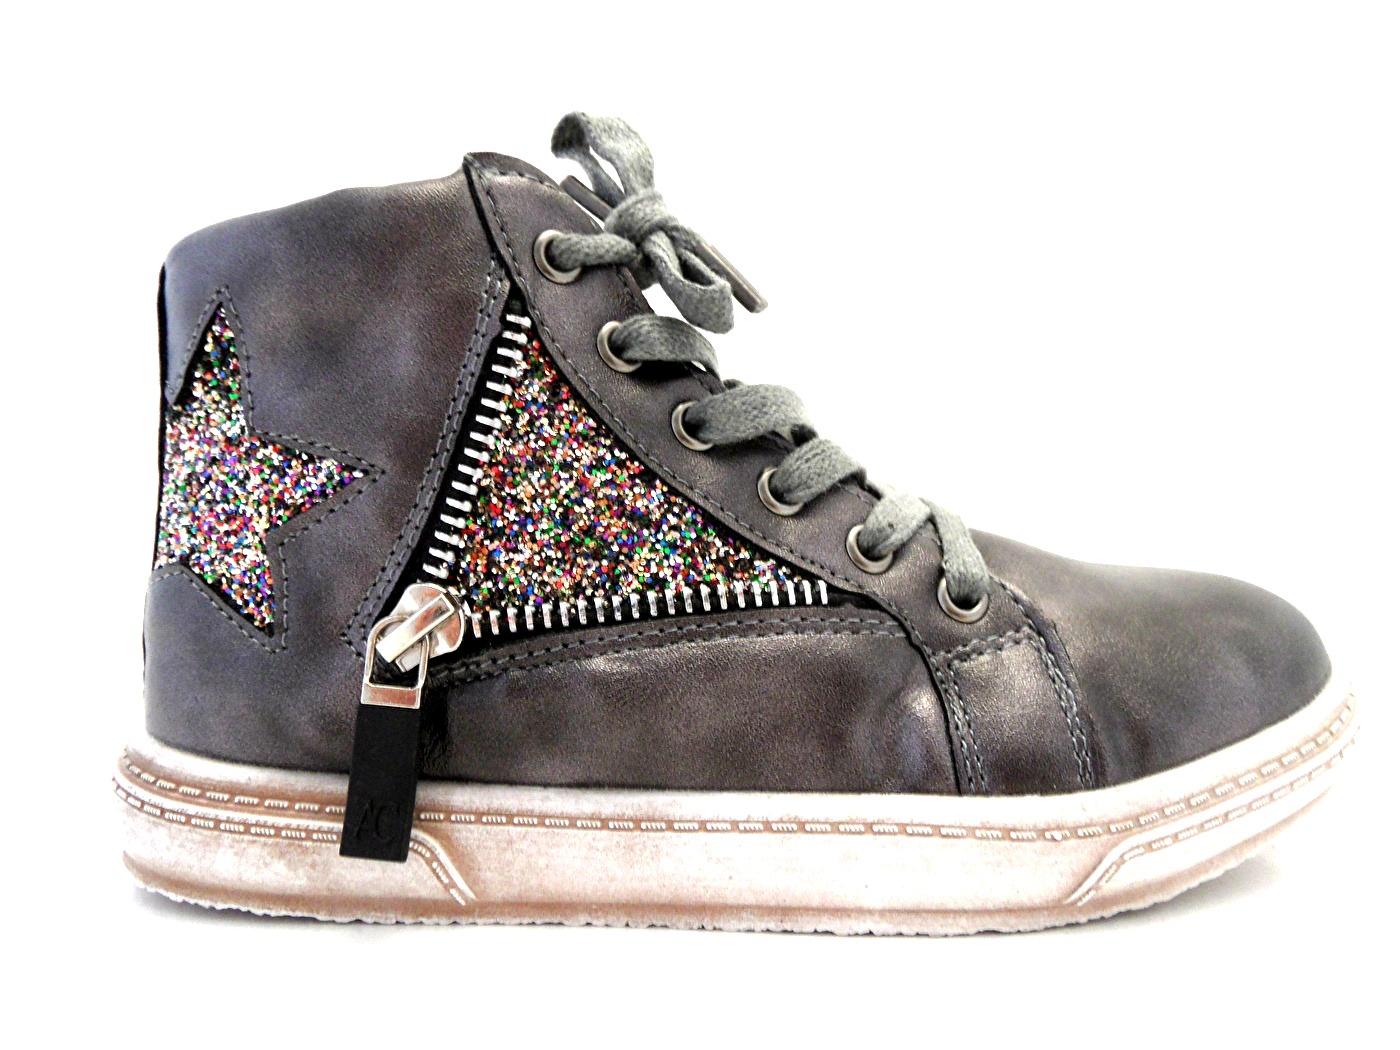 Wildflower Kennedia Anthracite Sneaker